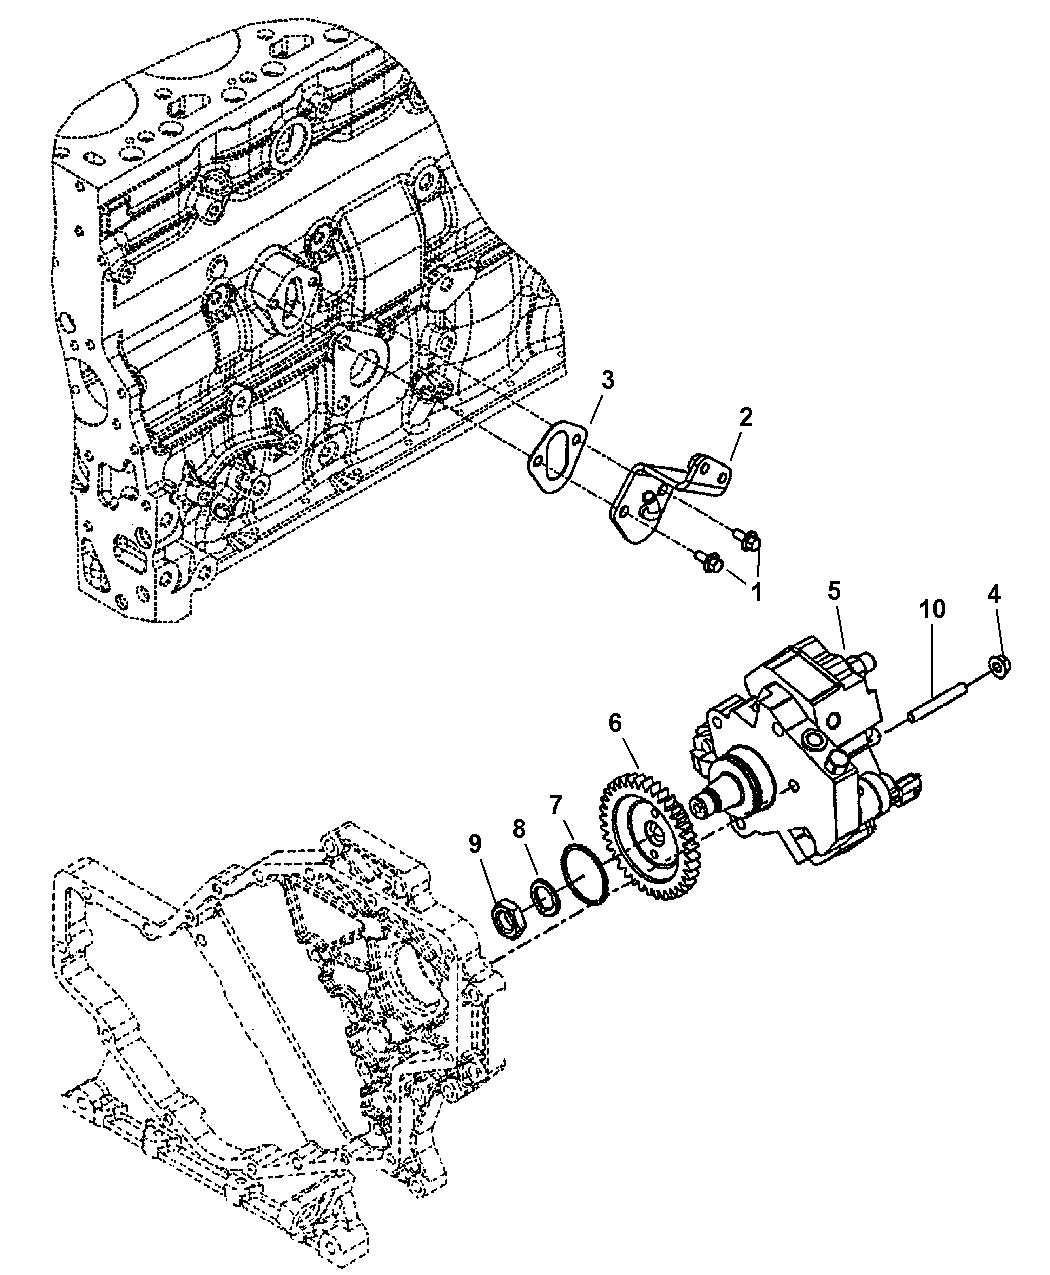 2004 dodge ram 2500 fuel injection pump